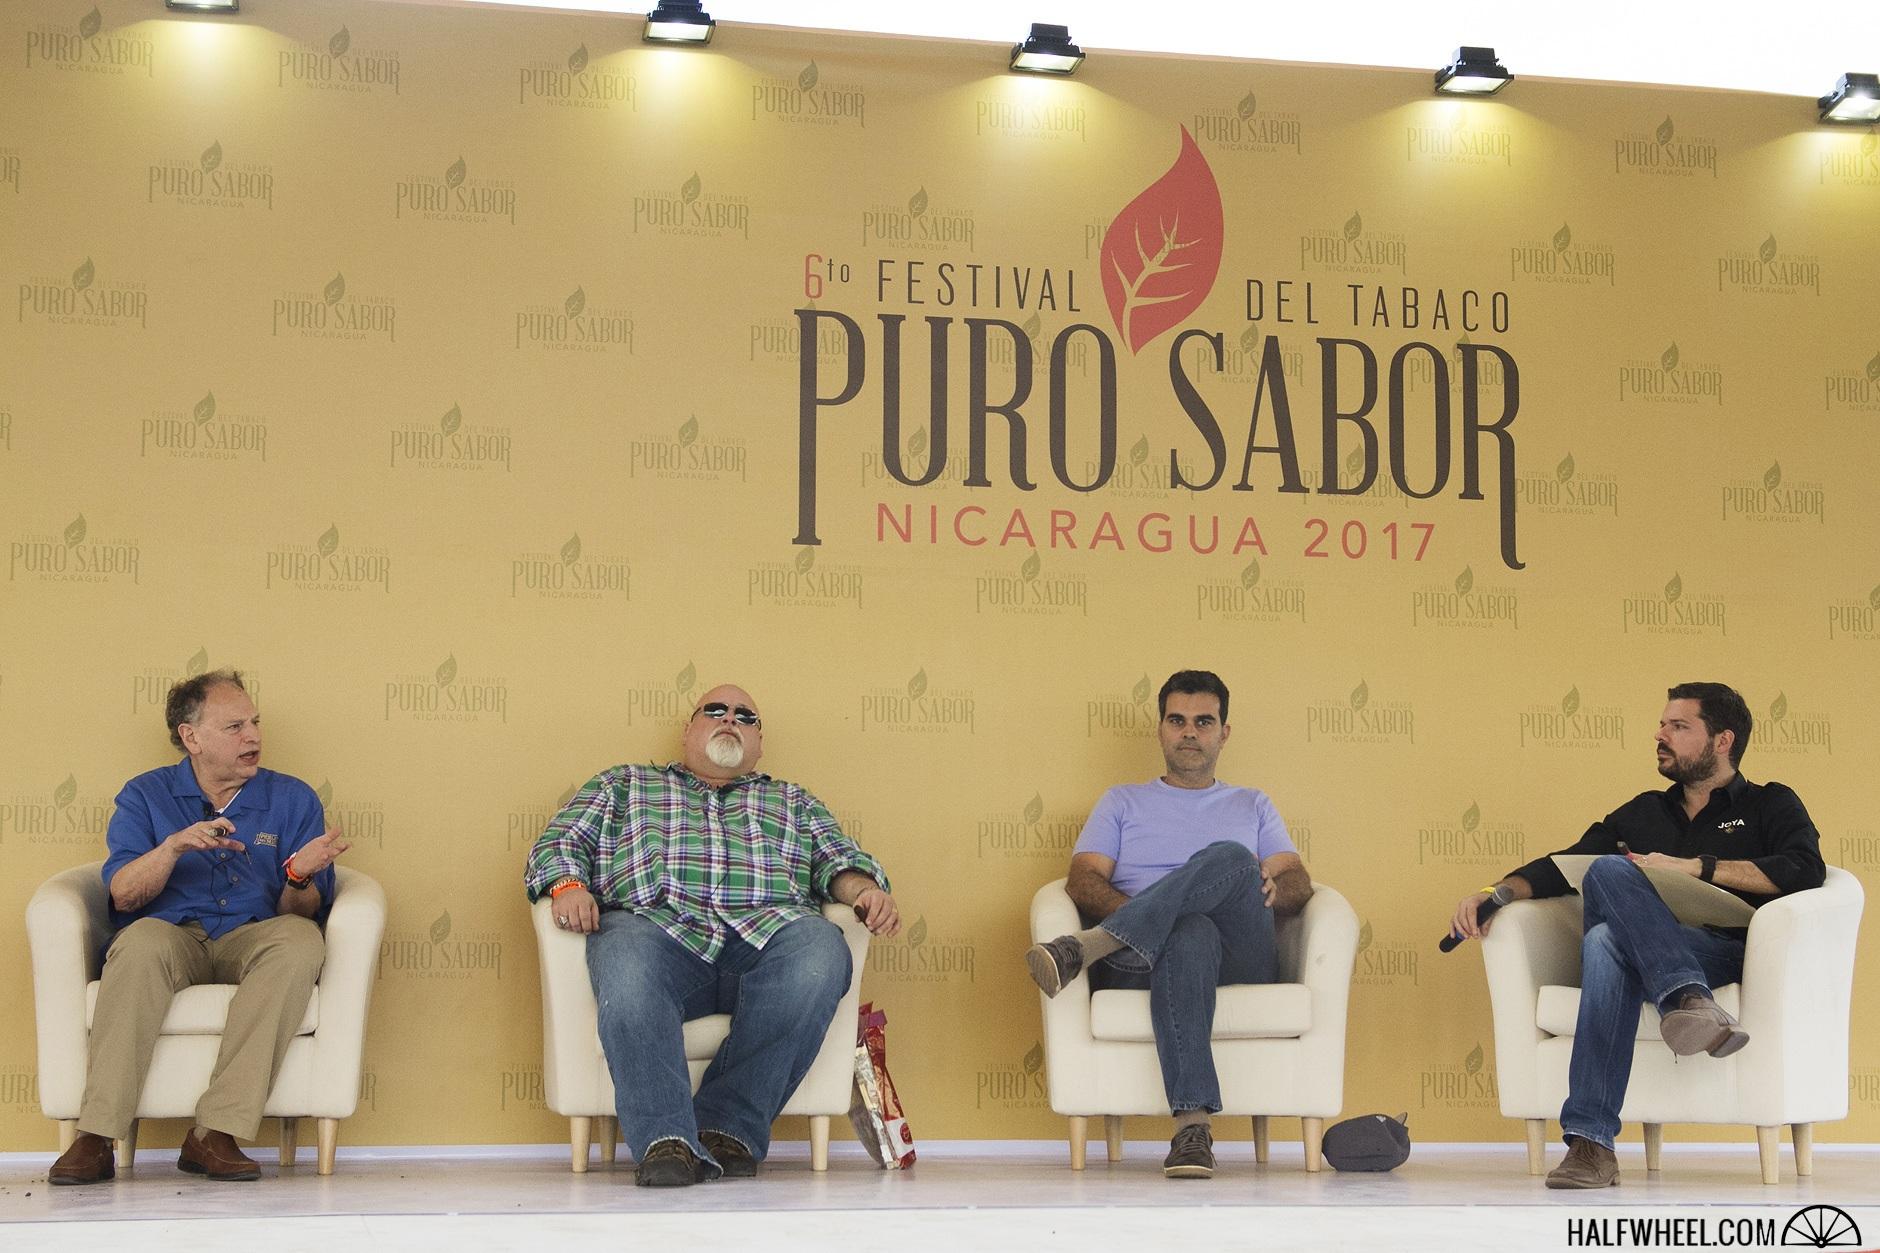 purosabor-nicaragua-2017-day-4-brand-building-seminar